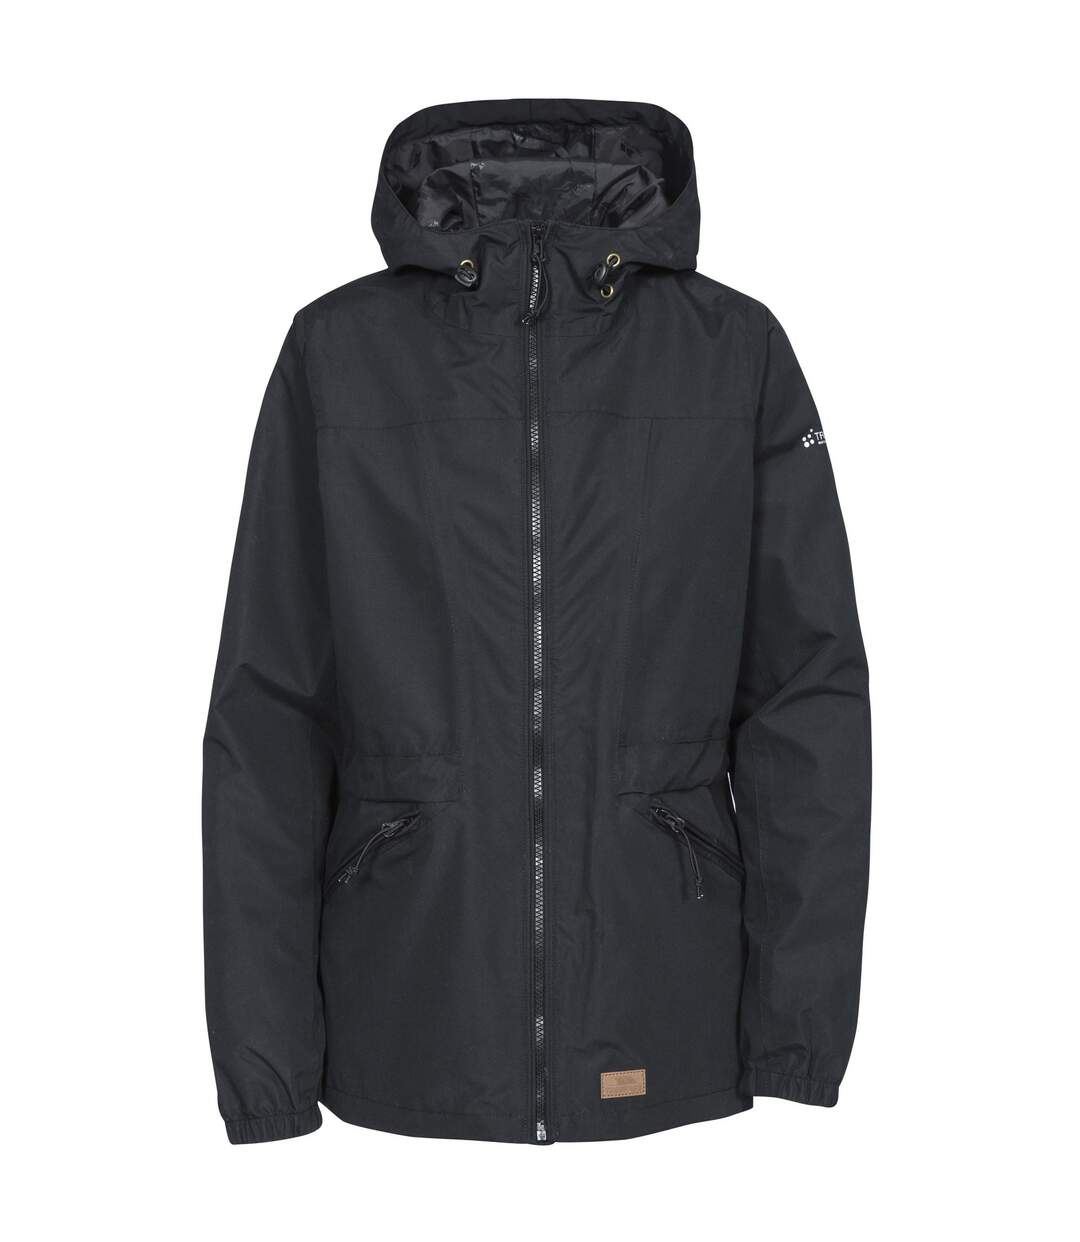 Trespass Womens/Ladies Cruella Waterproof Jacket (Black) - UTTP4017